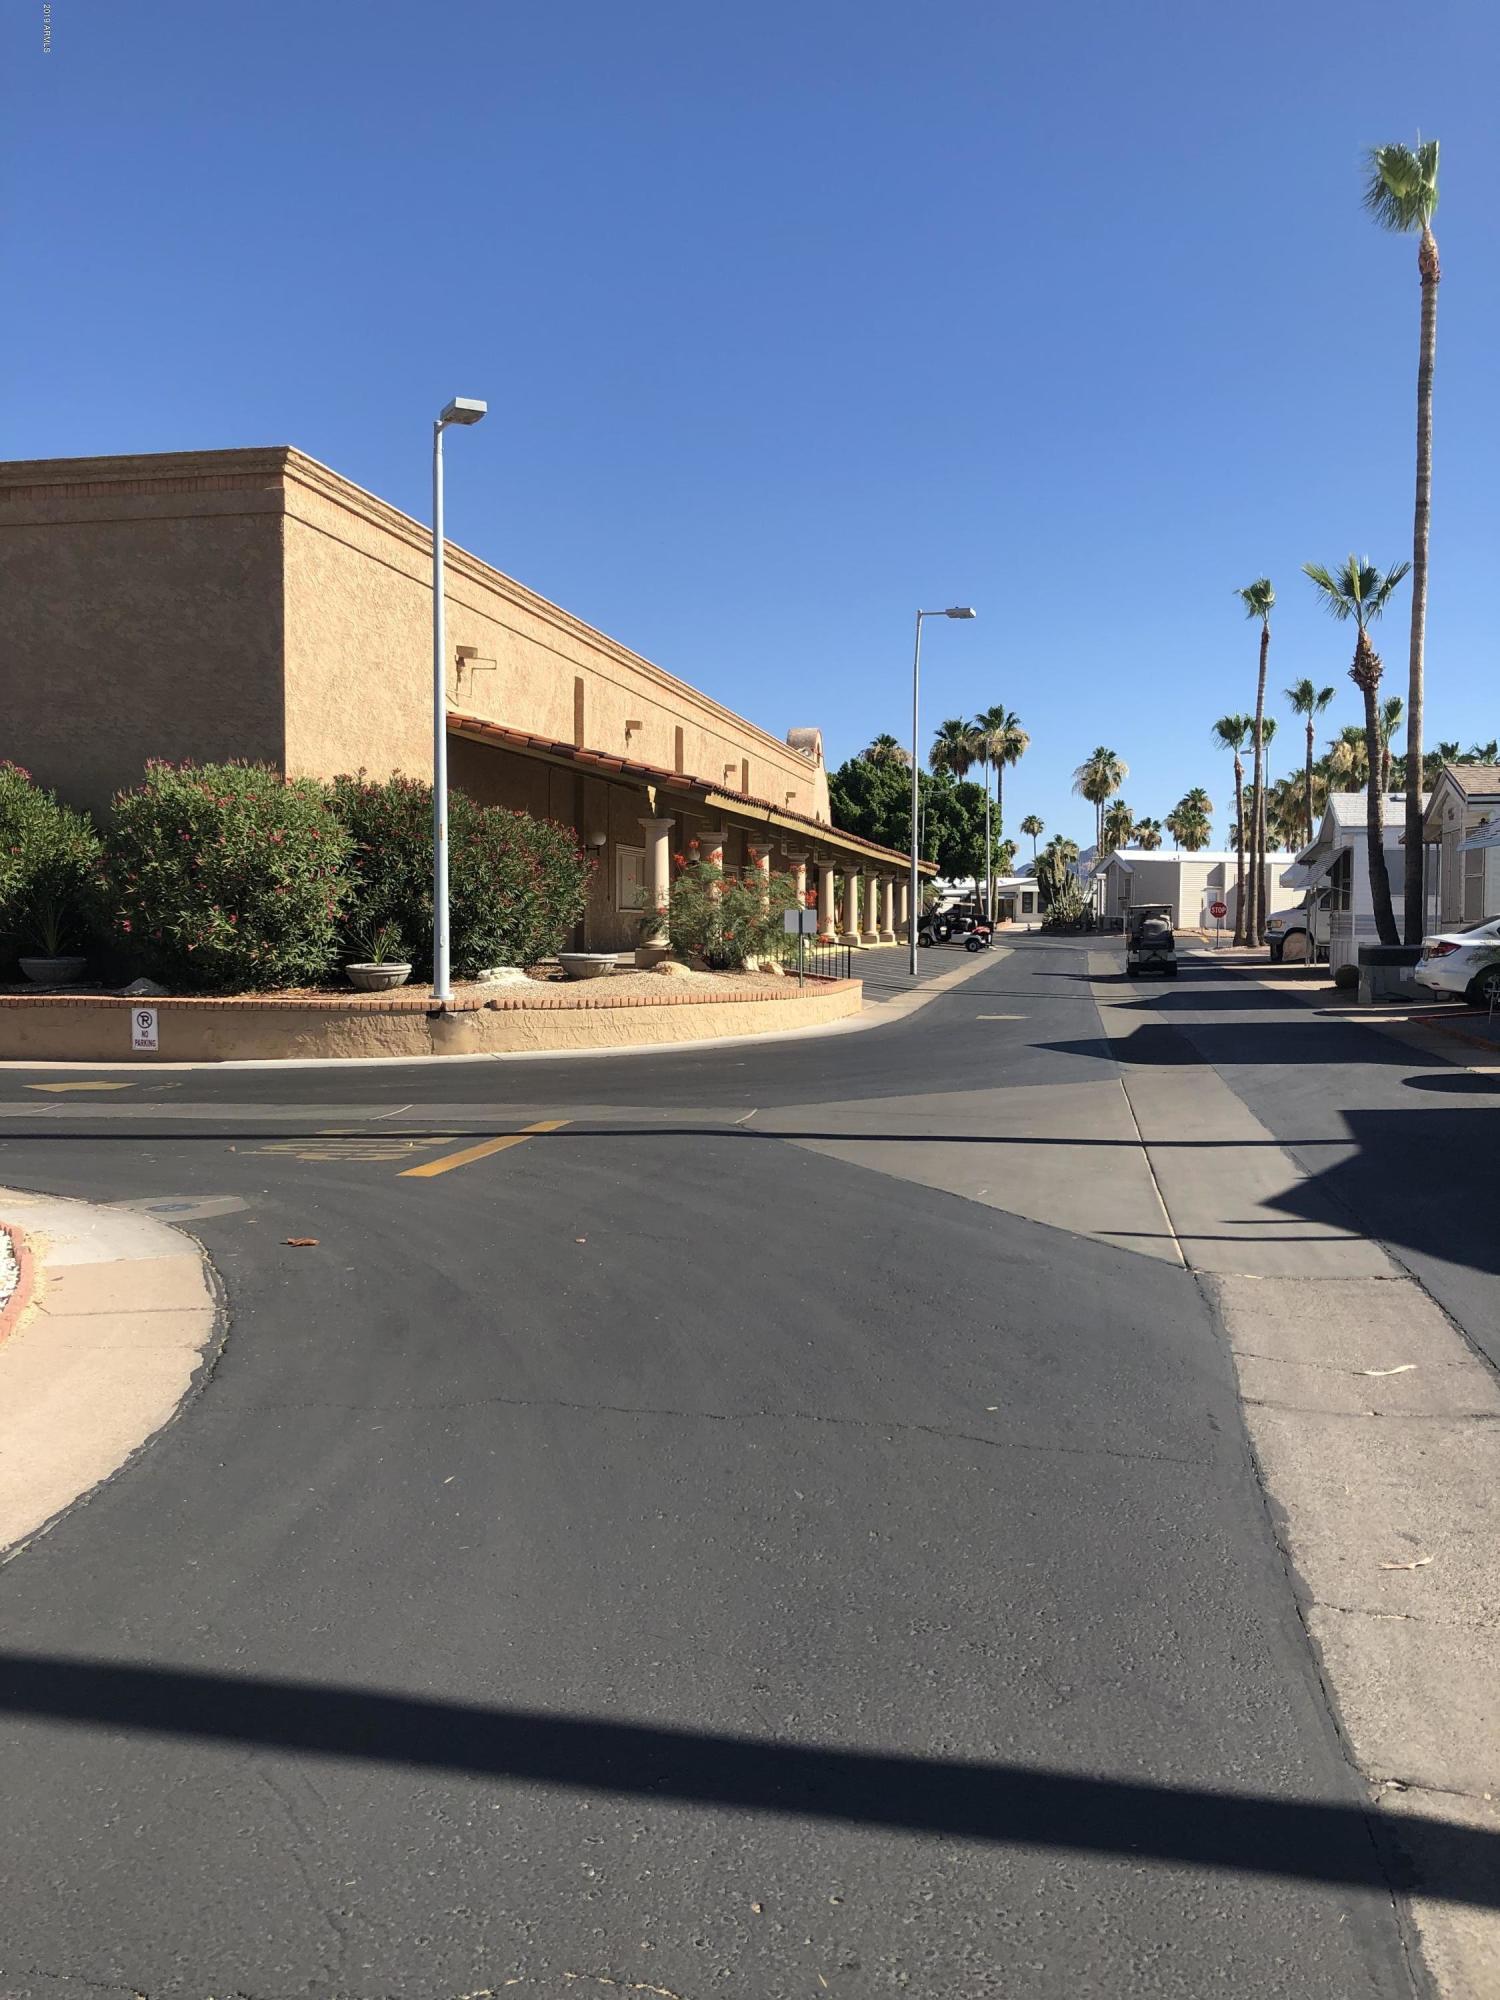 MLS 5941094 228 S Shawnee Drive, Apache Junction, AZ 85119 Apache Junction AZ Affordable